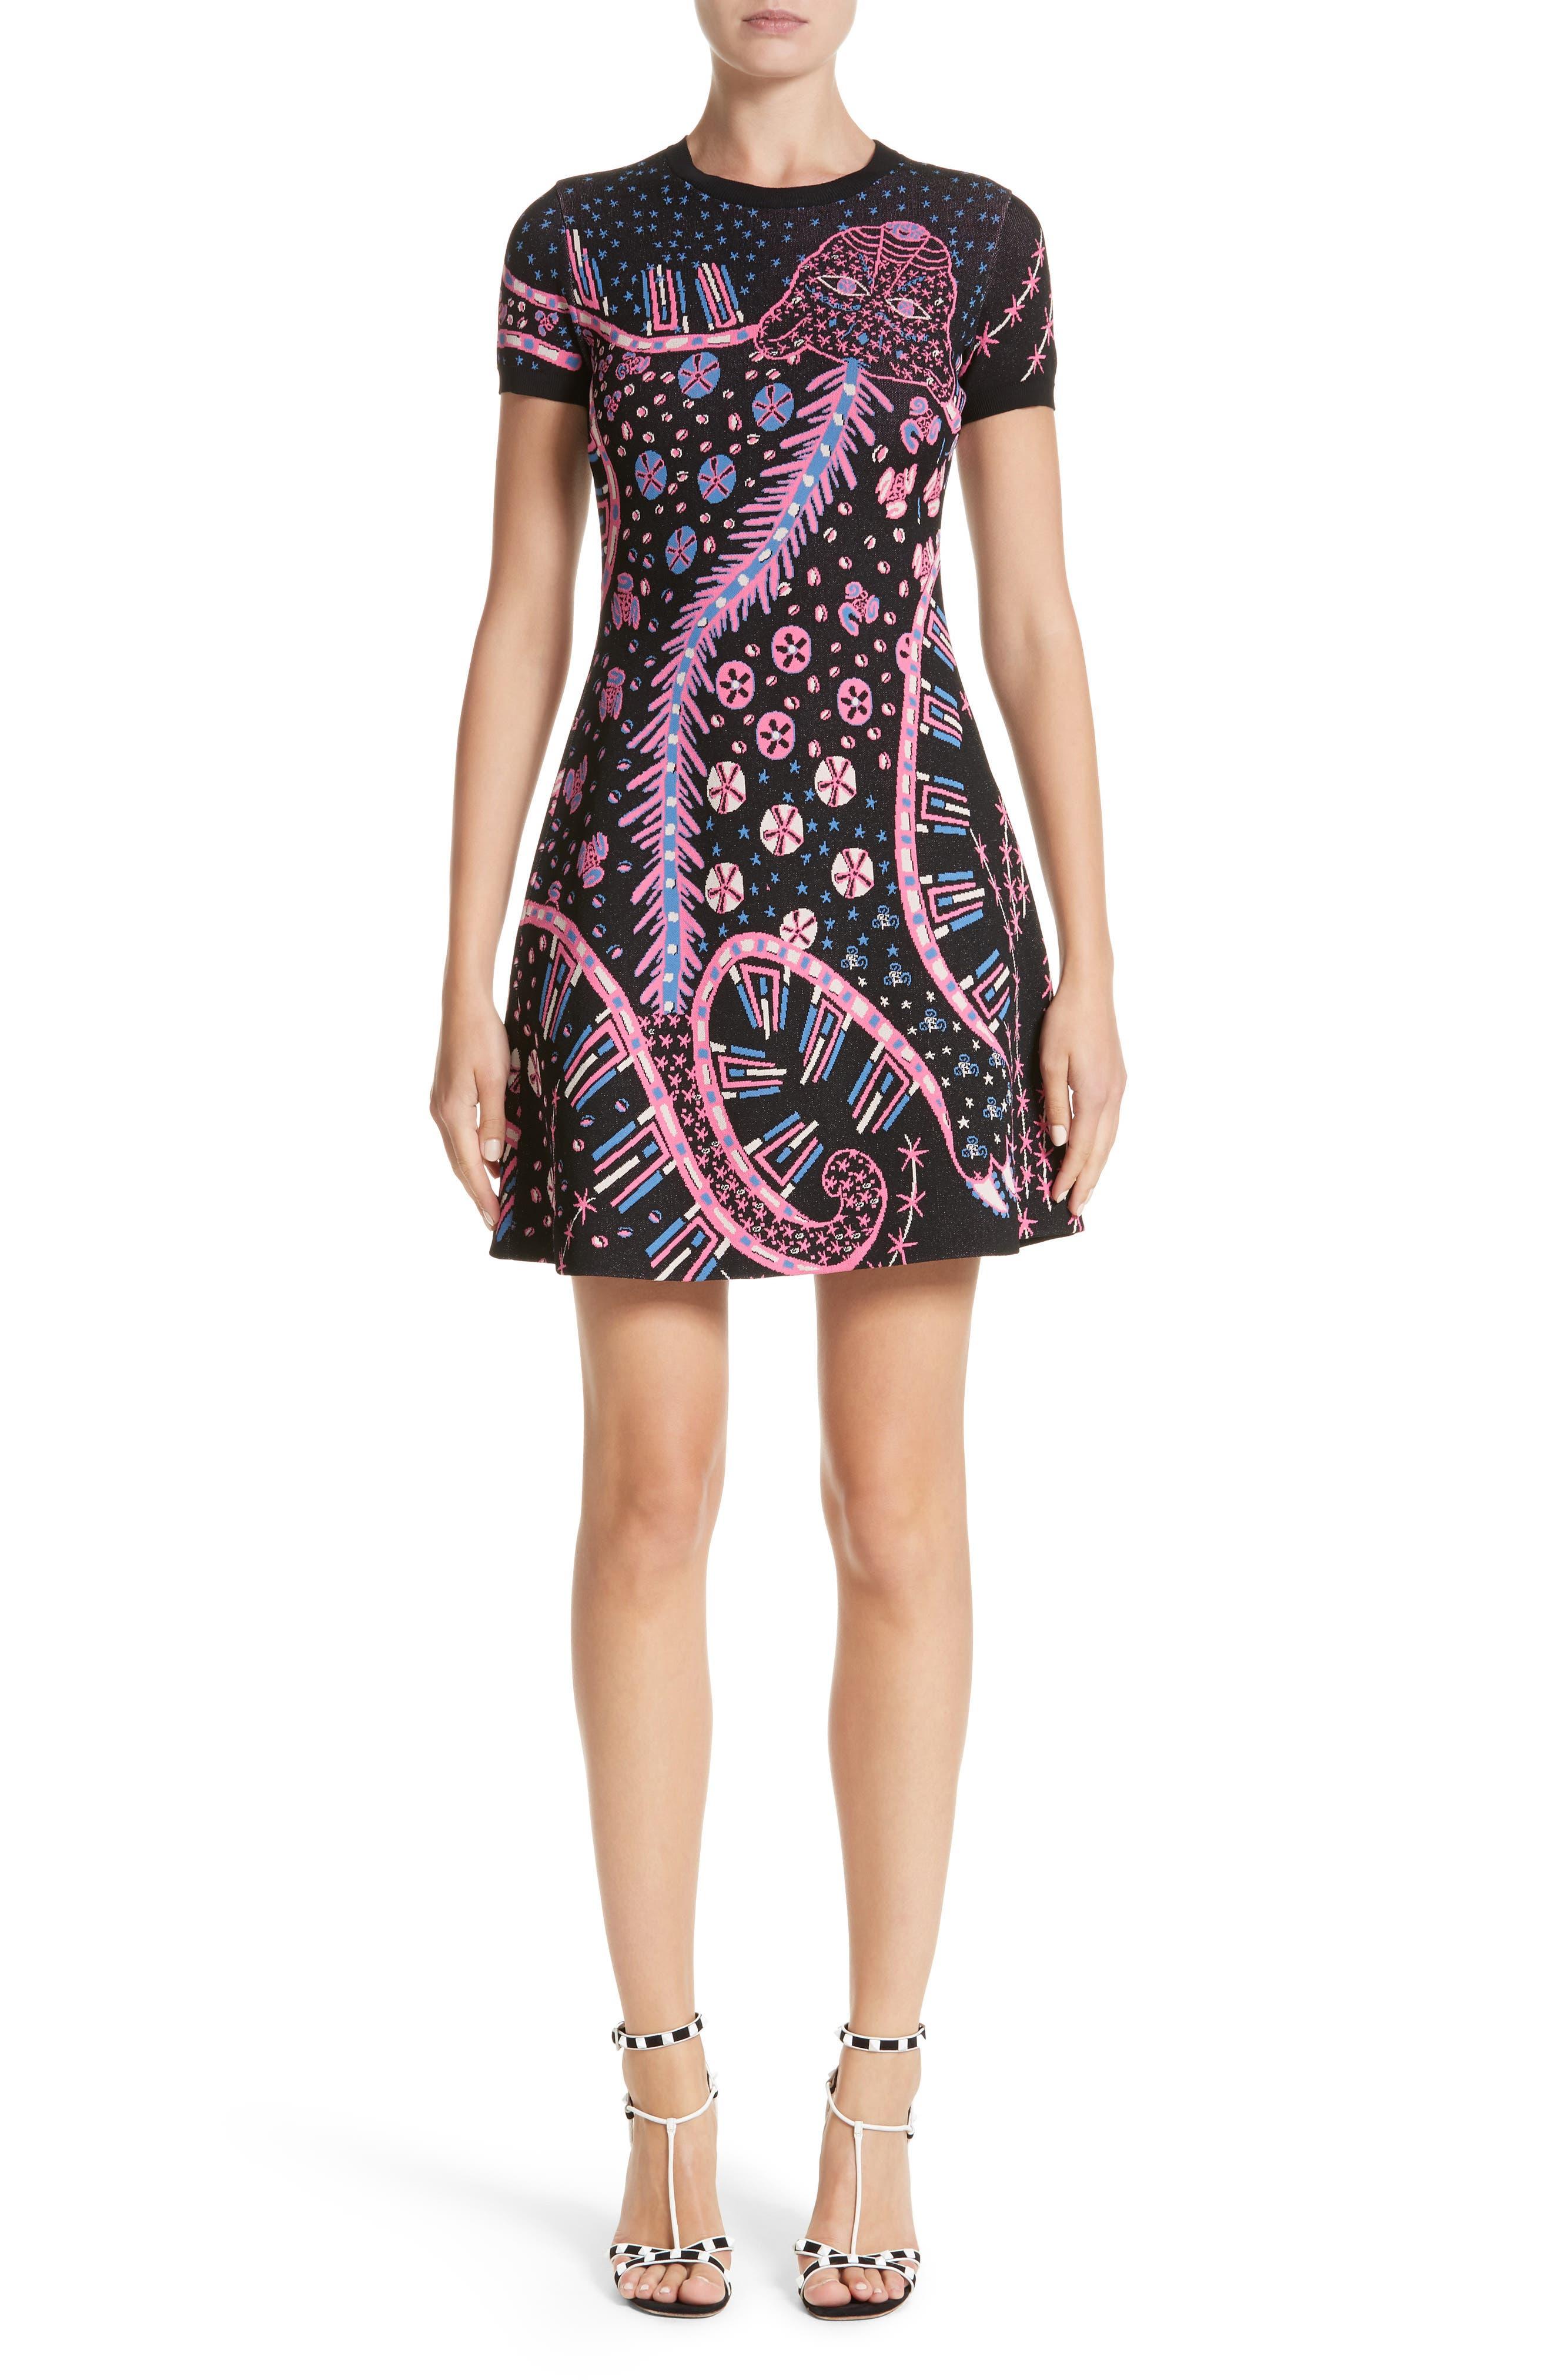 Valentino Leopard Stretch Knit Dress